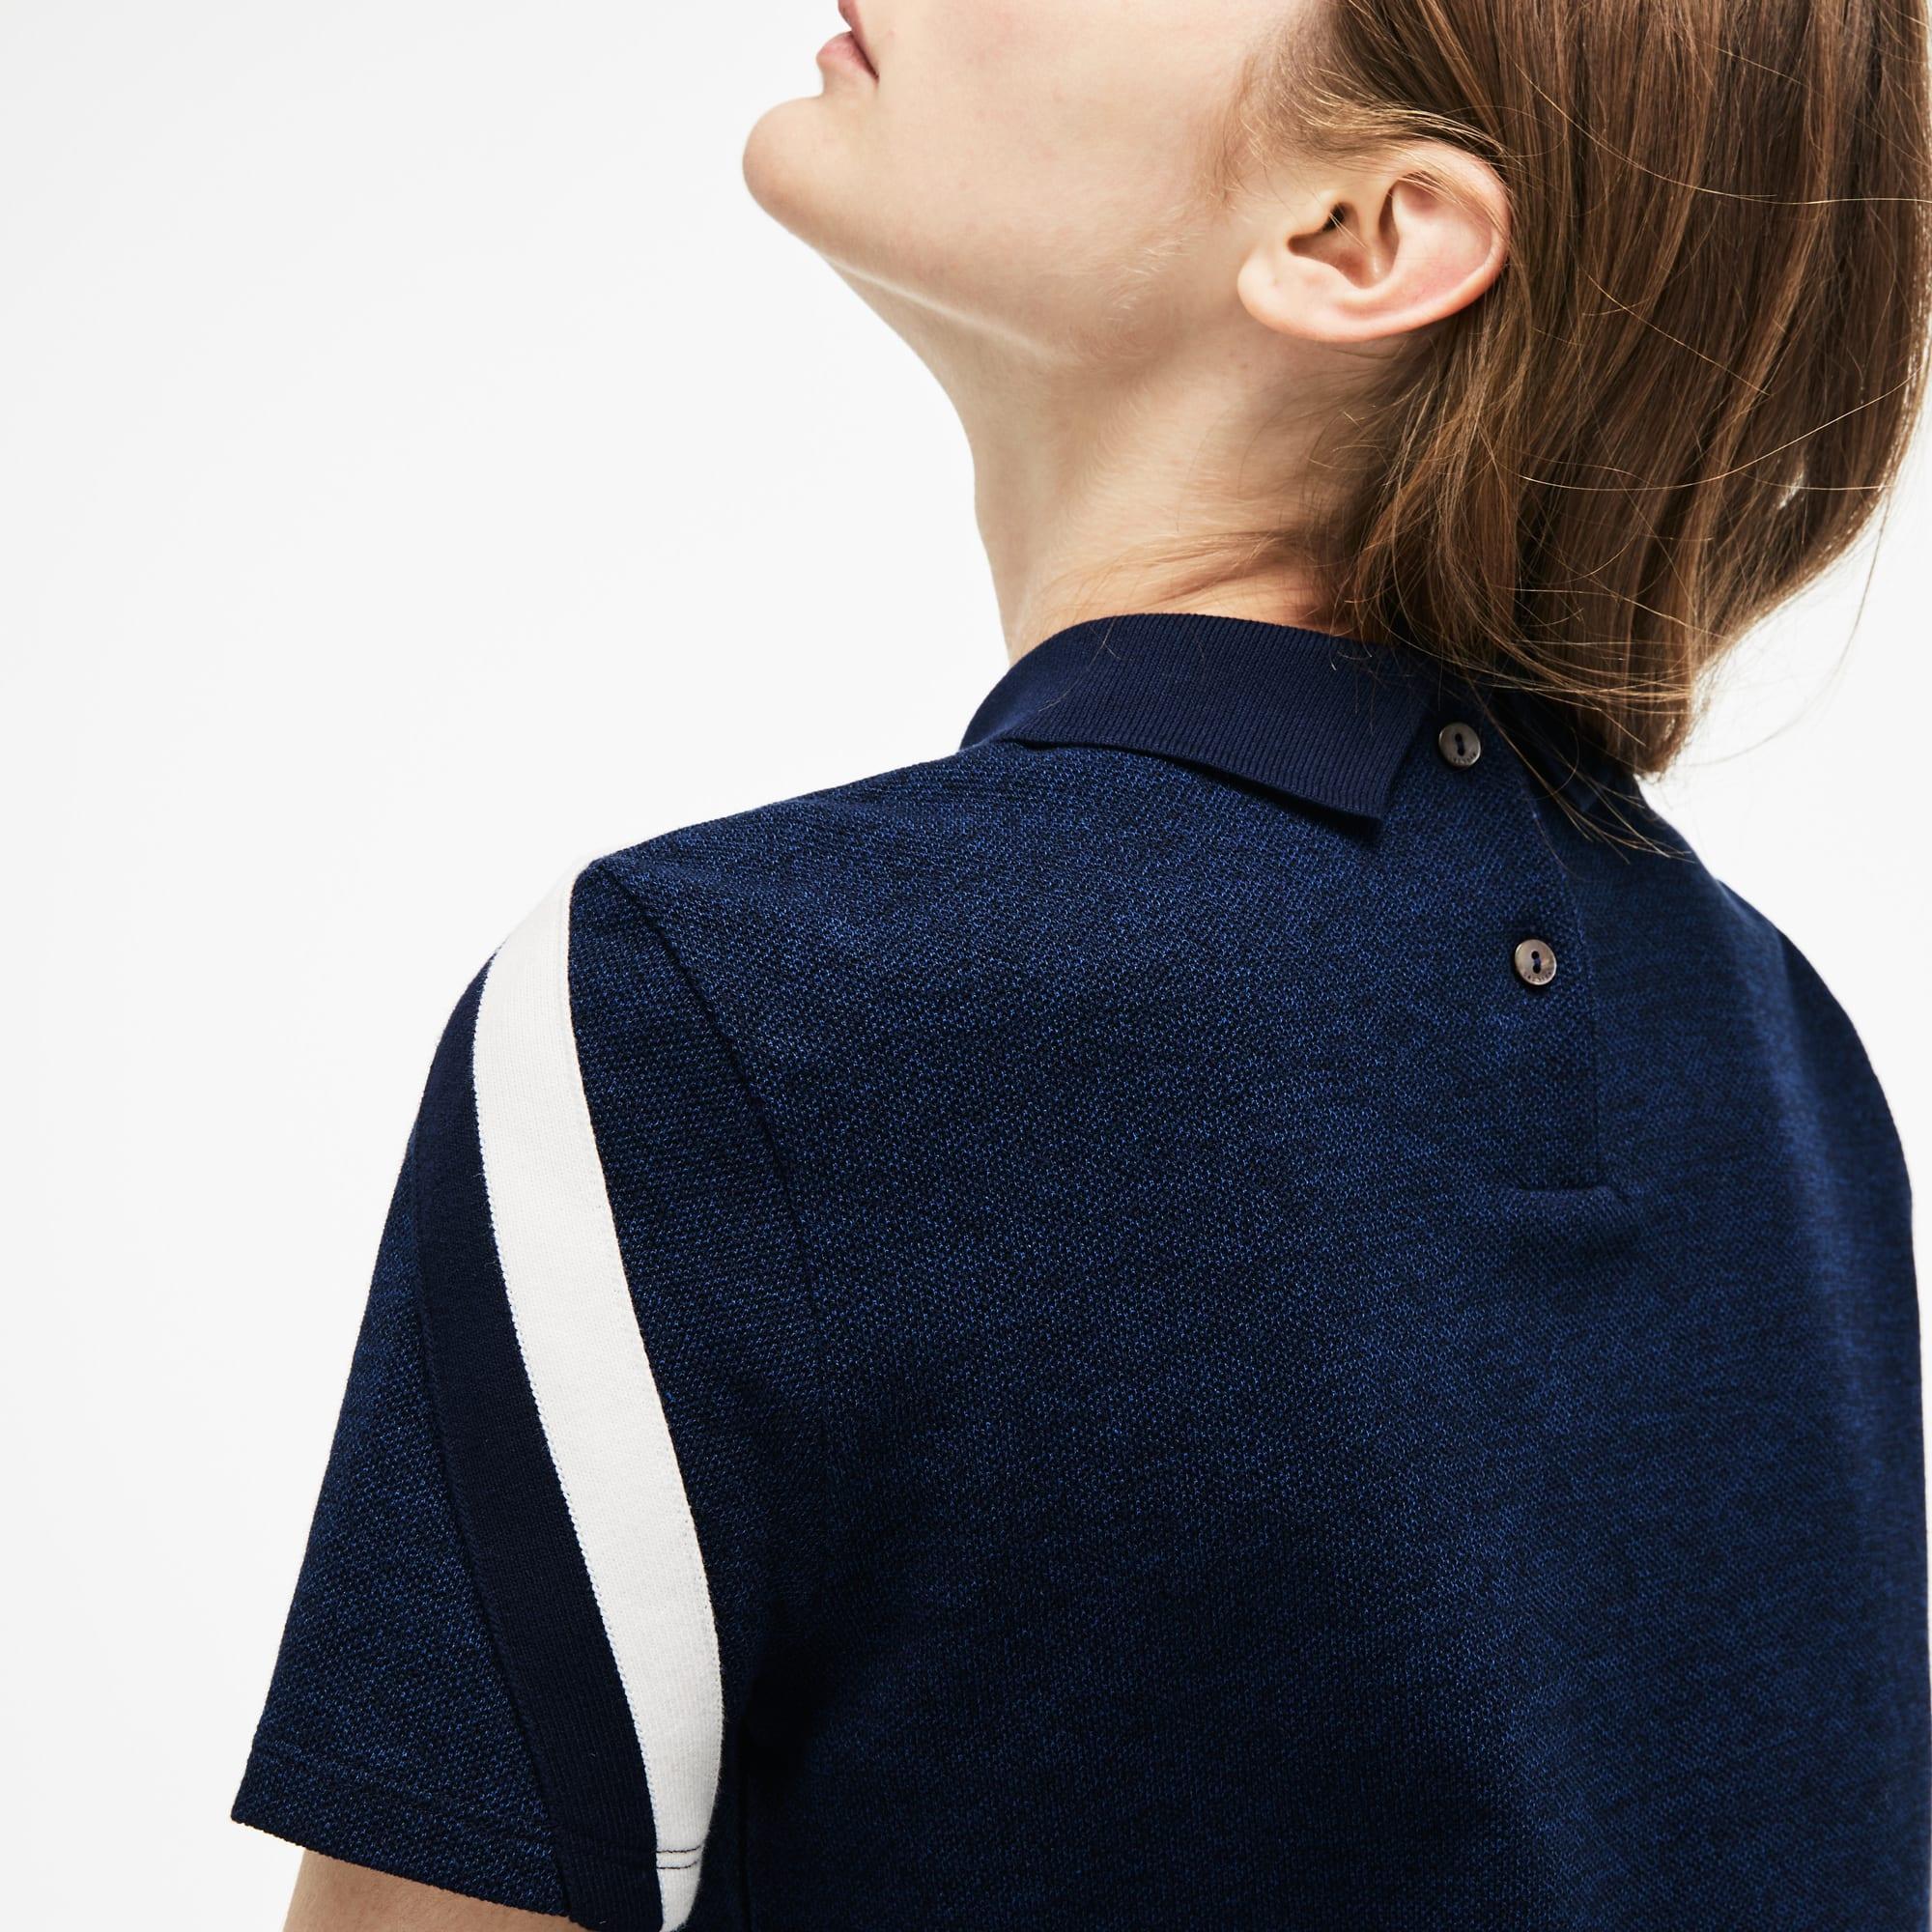 Damen LACOSTE MOTION Poloshirt aus dreifarbigem Kaviar-Piqué